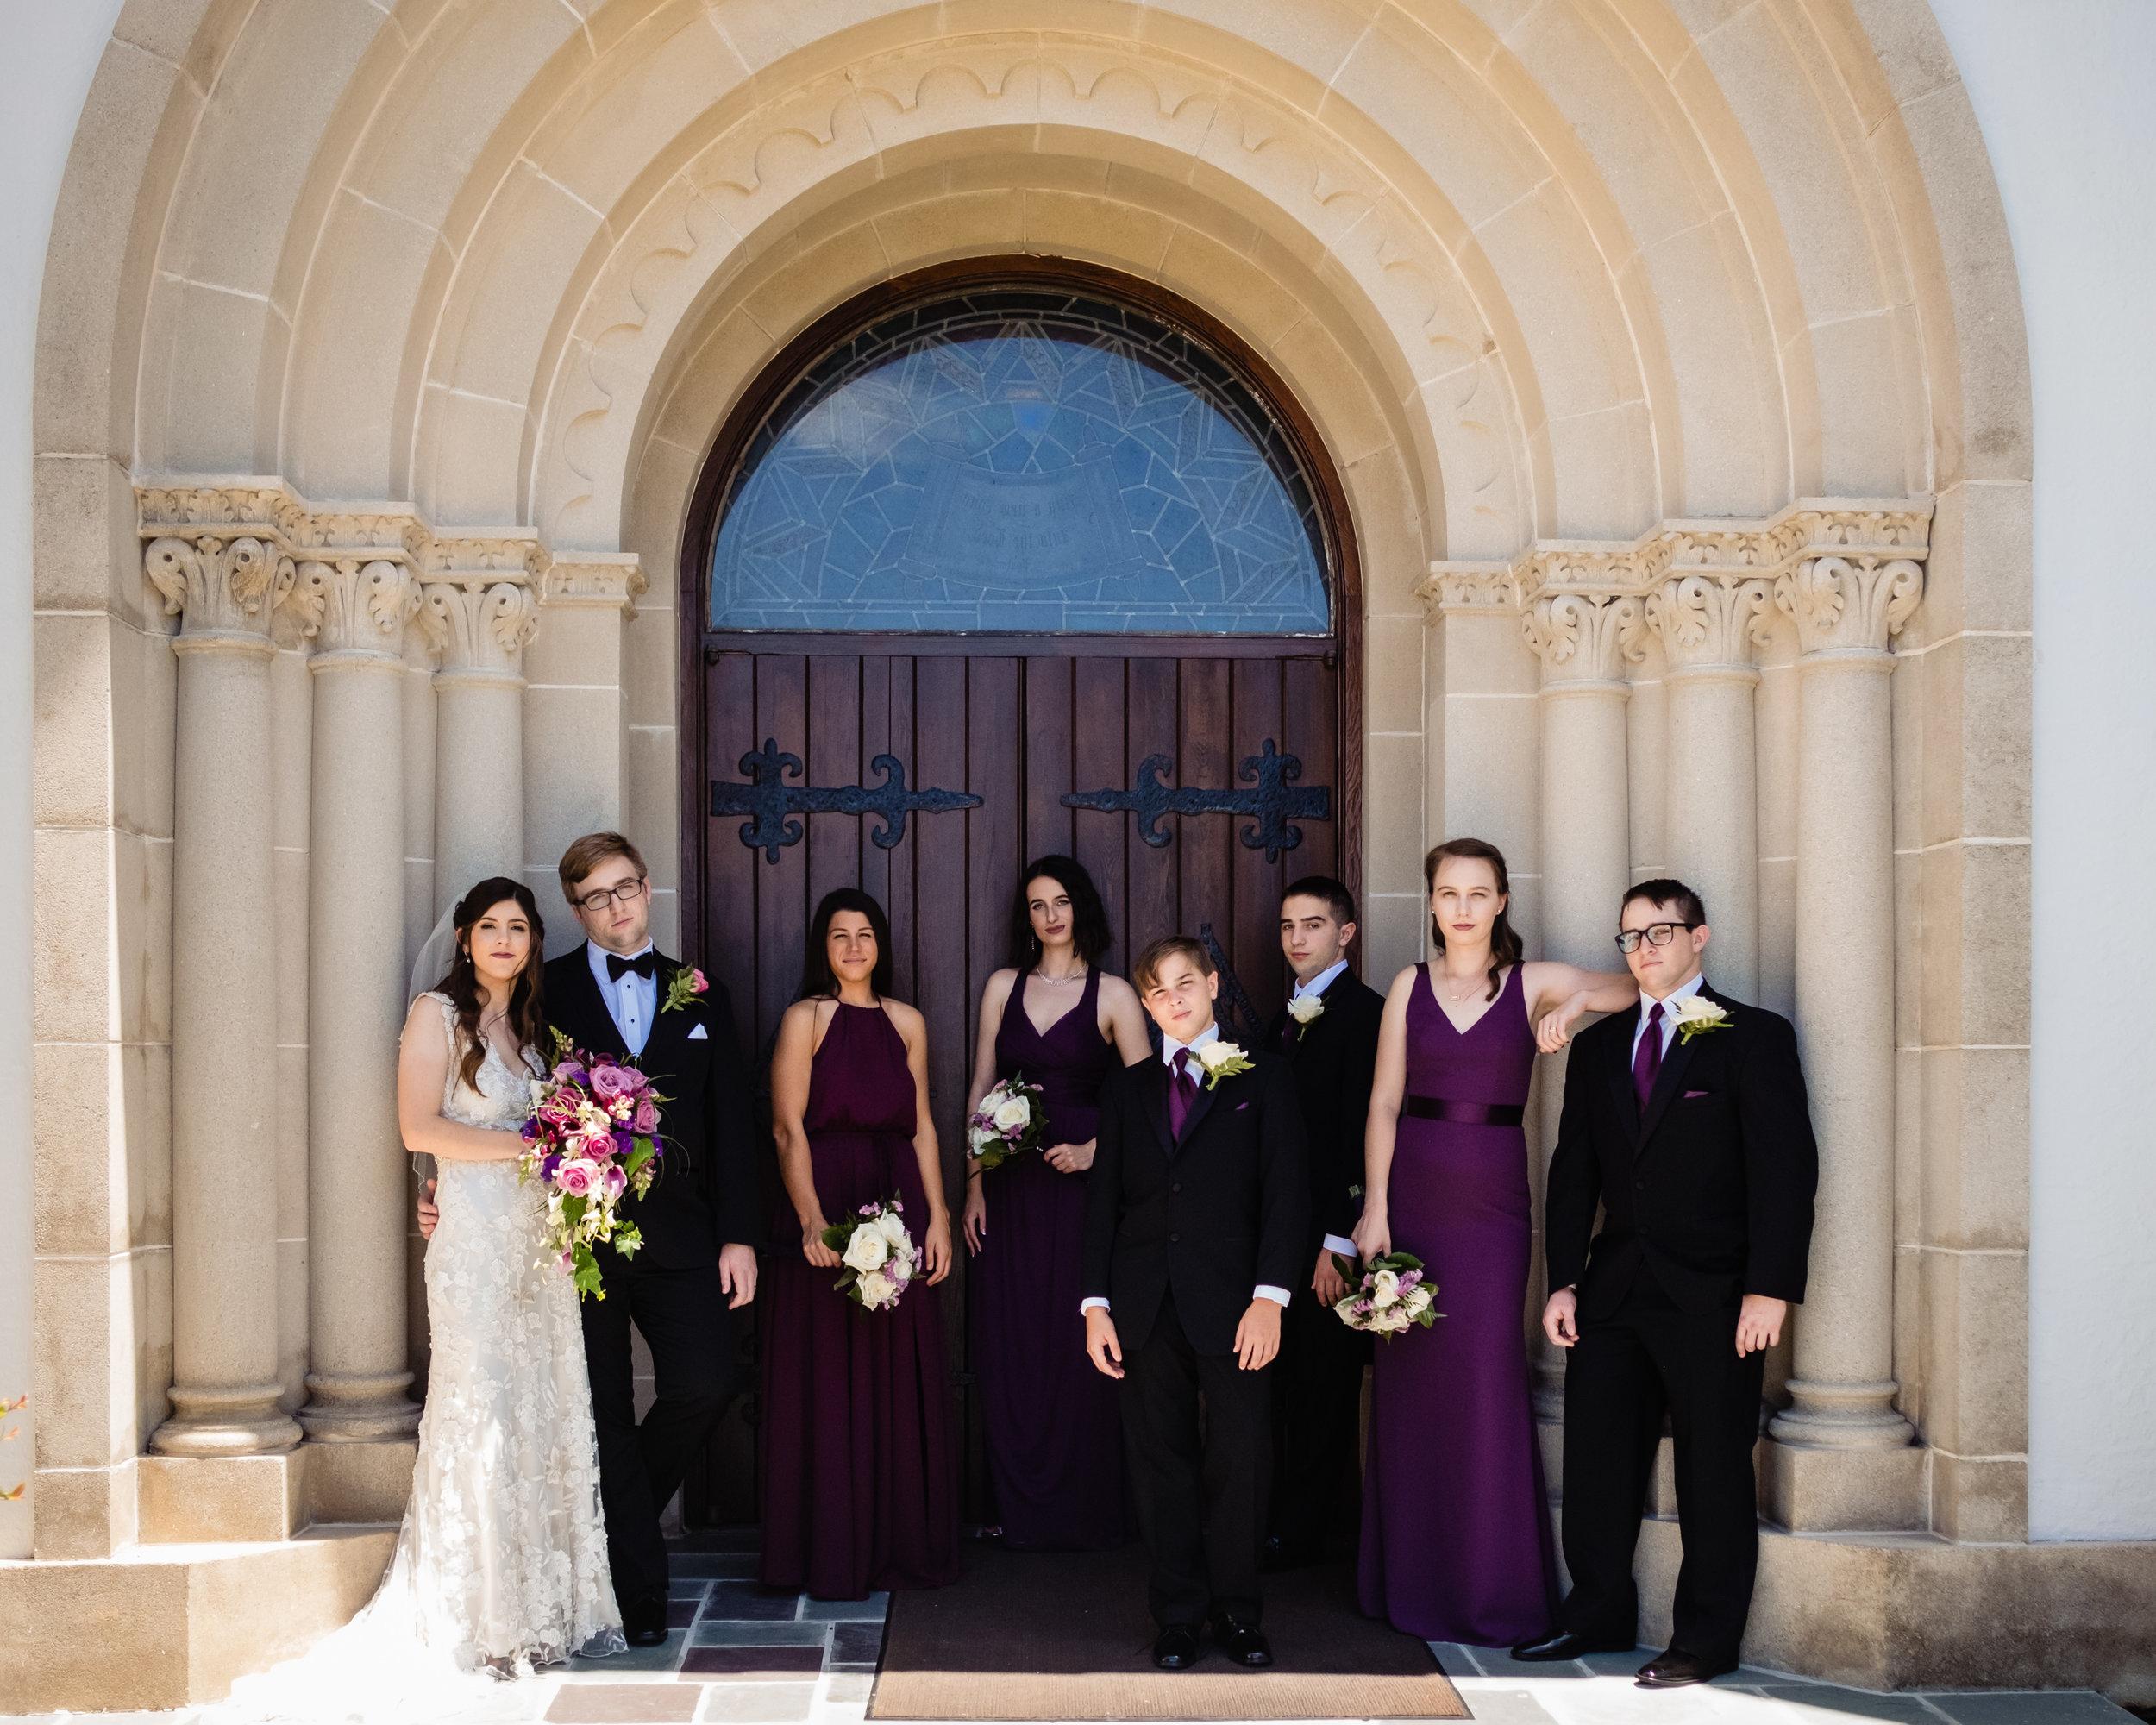 HAH_Zoe and Daniel_Clearwater Wedding_316_2018.jpg